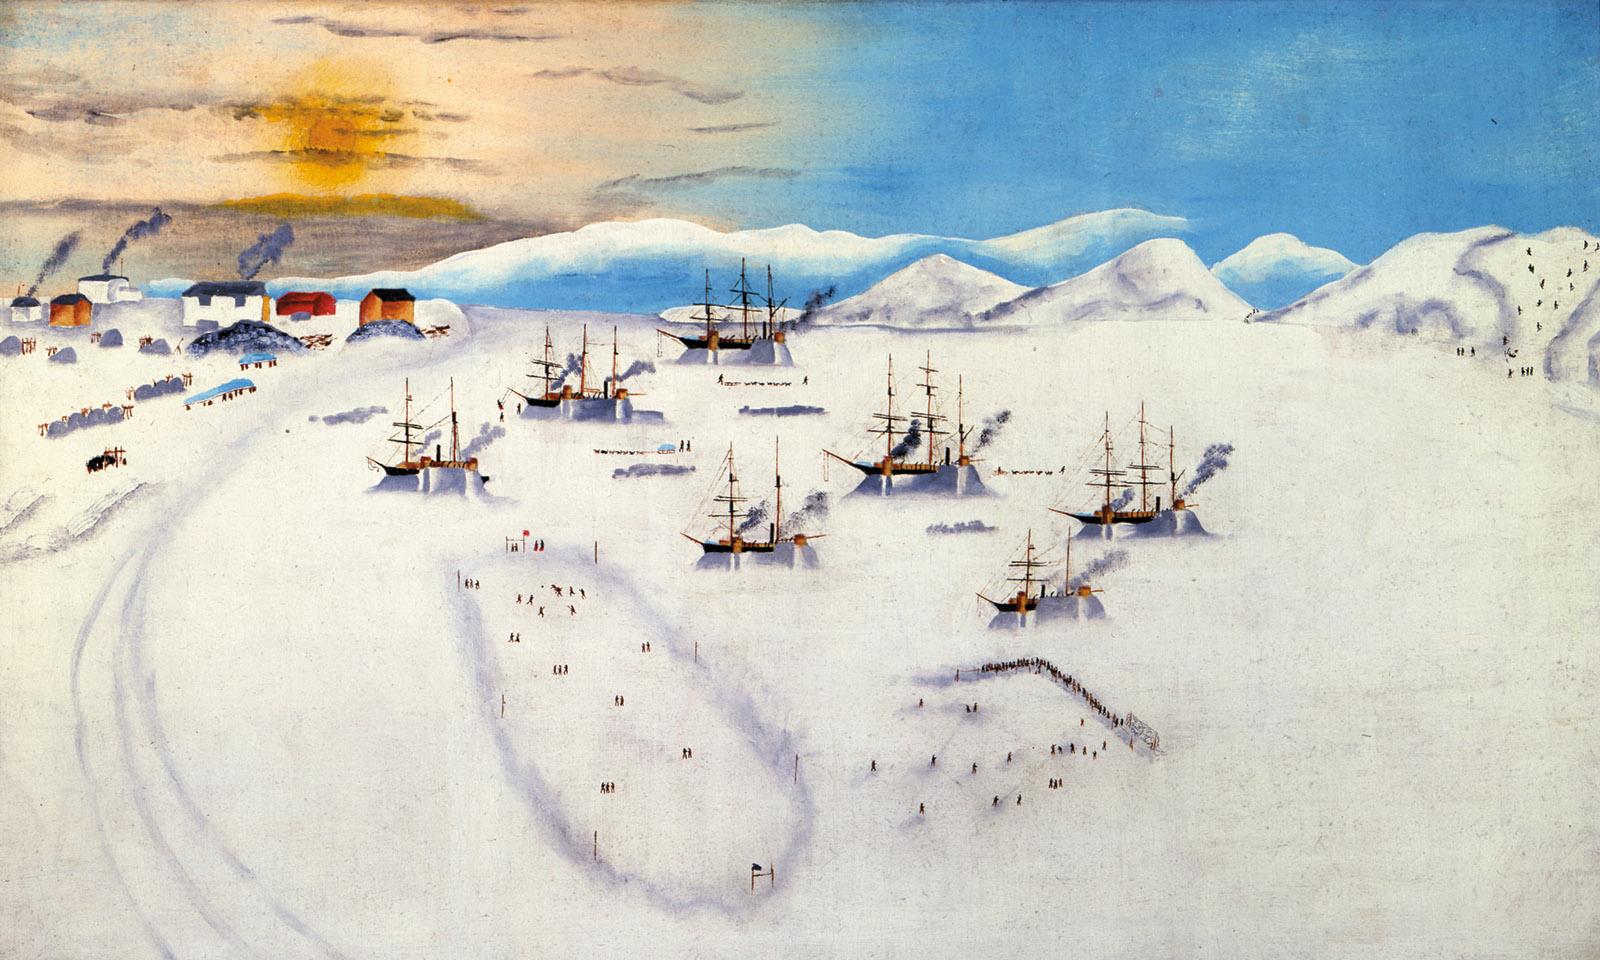 Whaling ships wintering at Herschel Island; painting by John Bertonccini, circa 1894